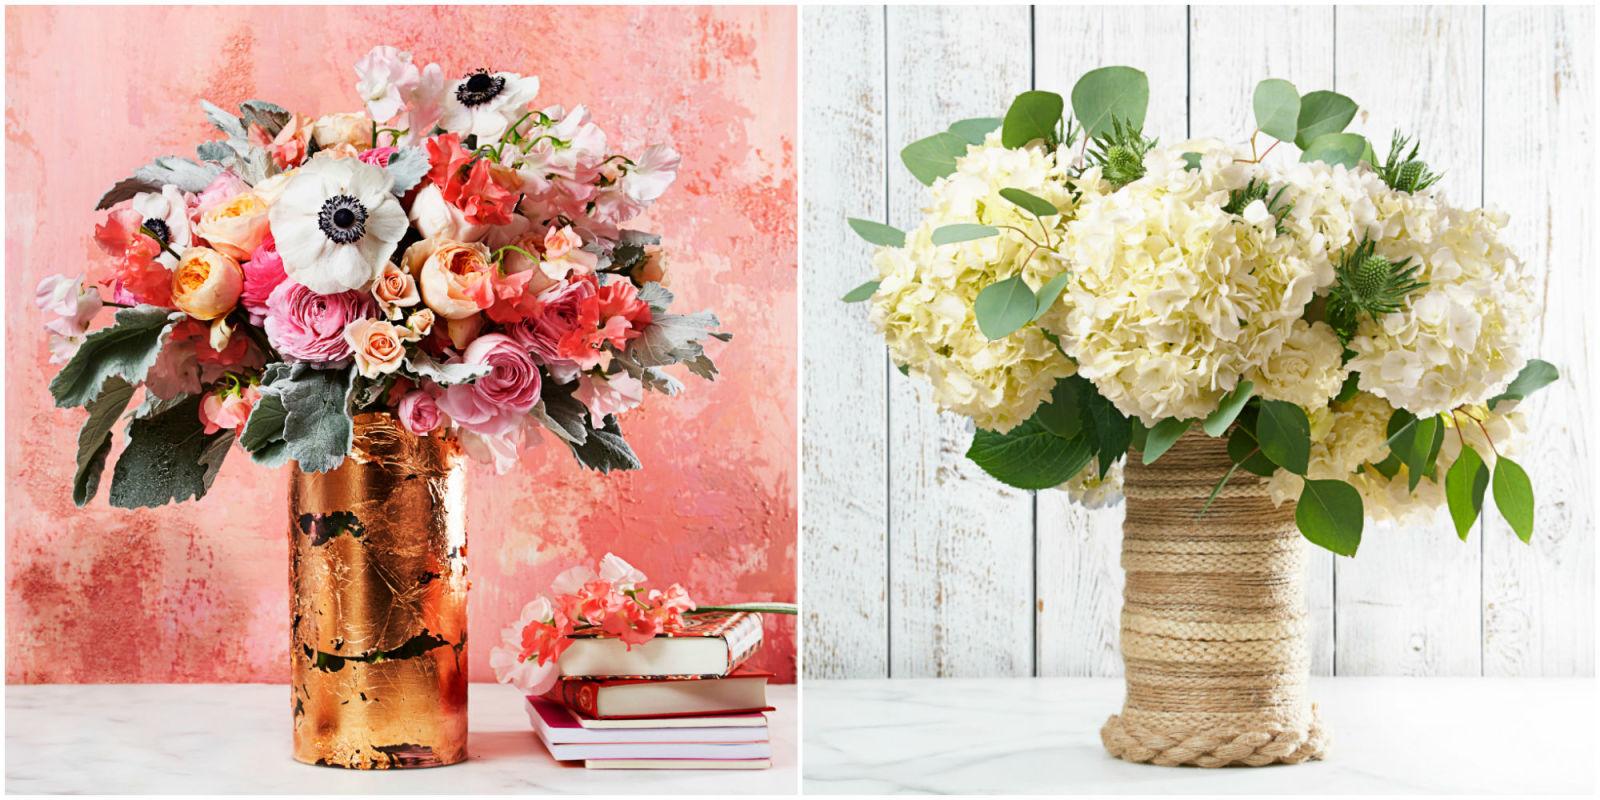 Decorate a glass vase glass vase crafts reviewsmspy